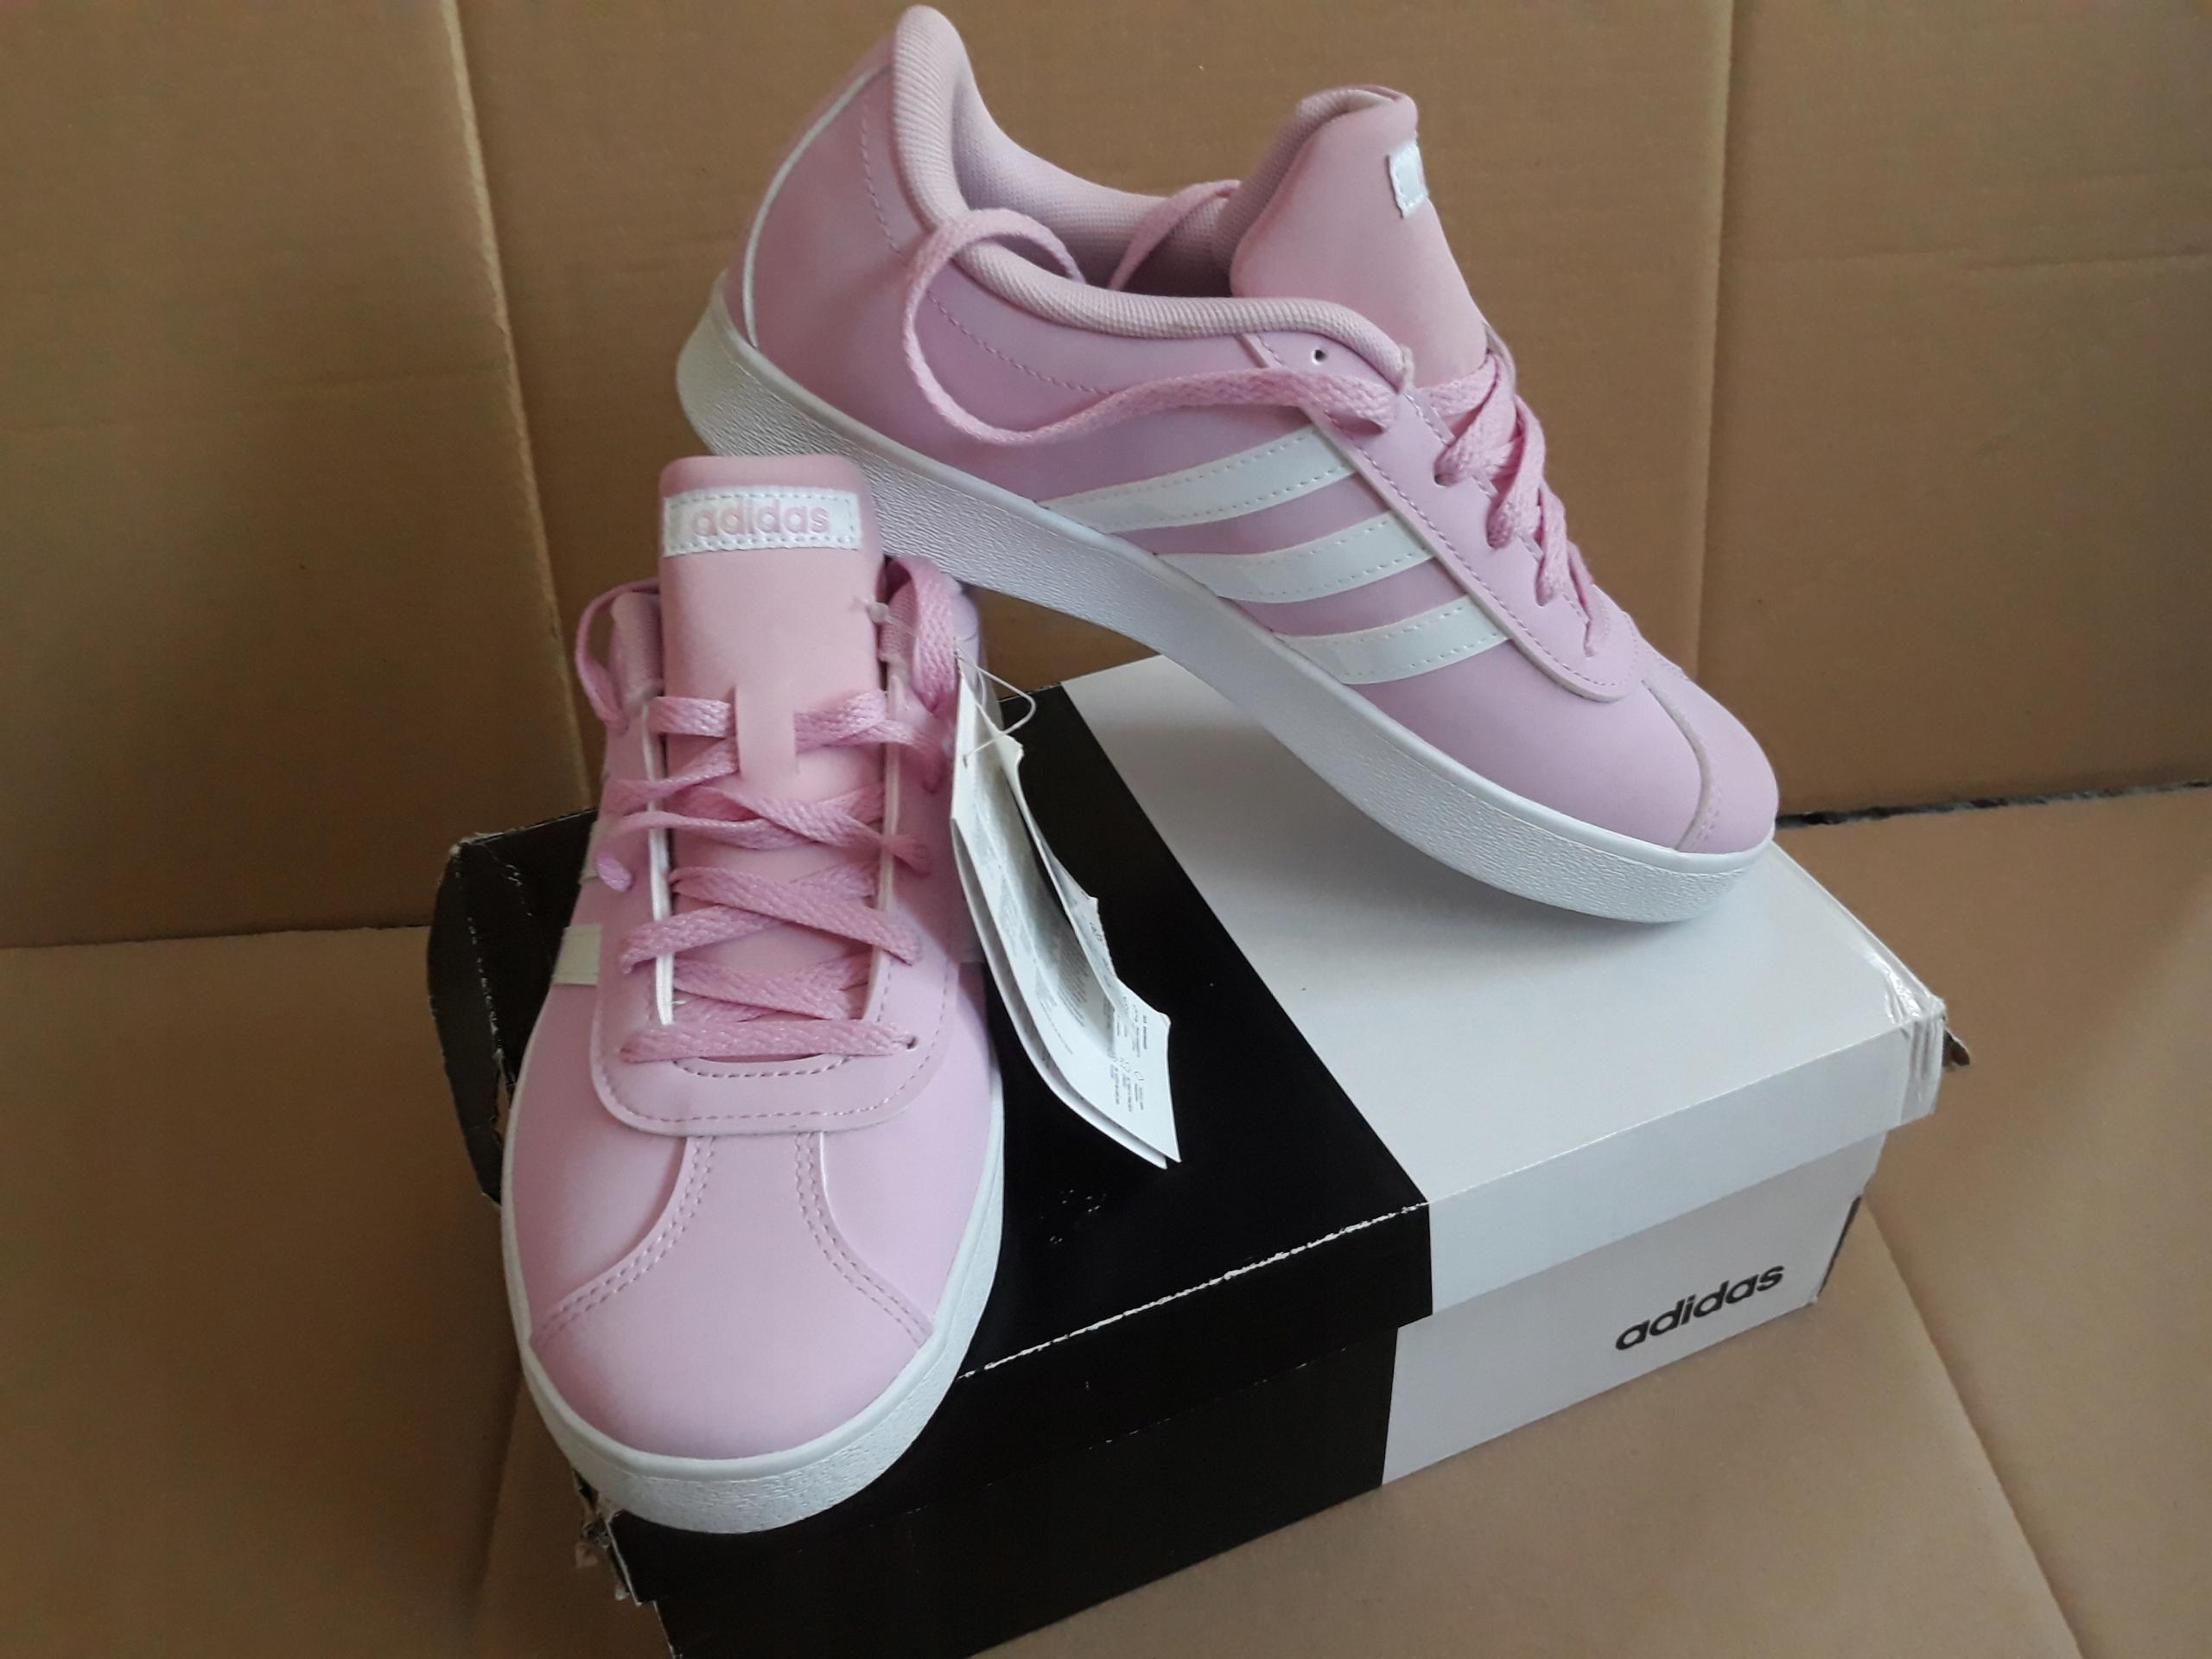 Buty adidas VL Court DB1517 38